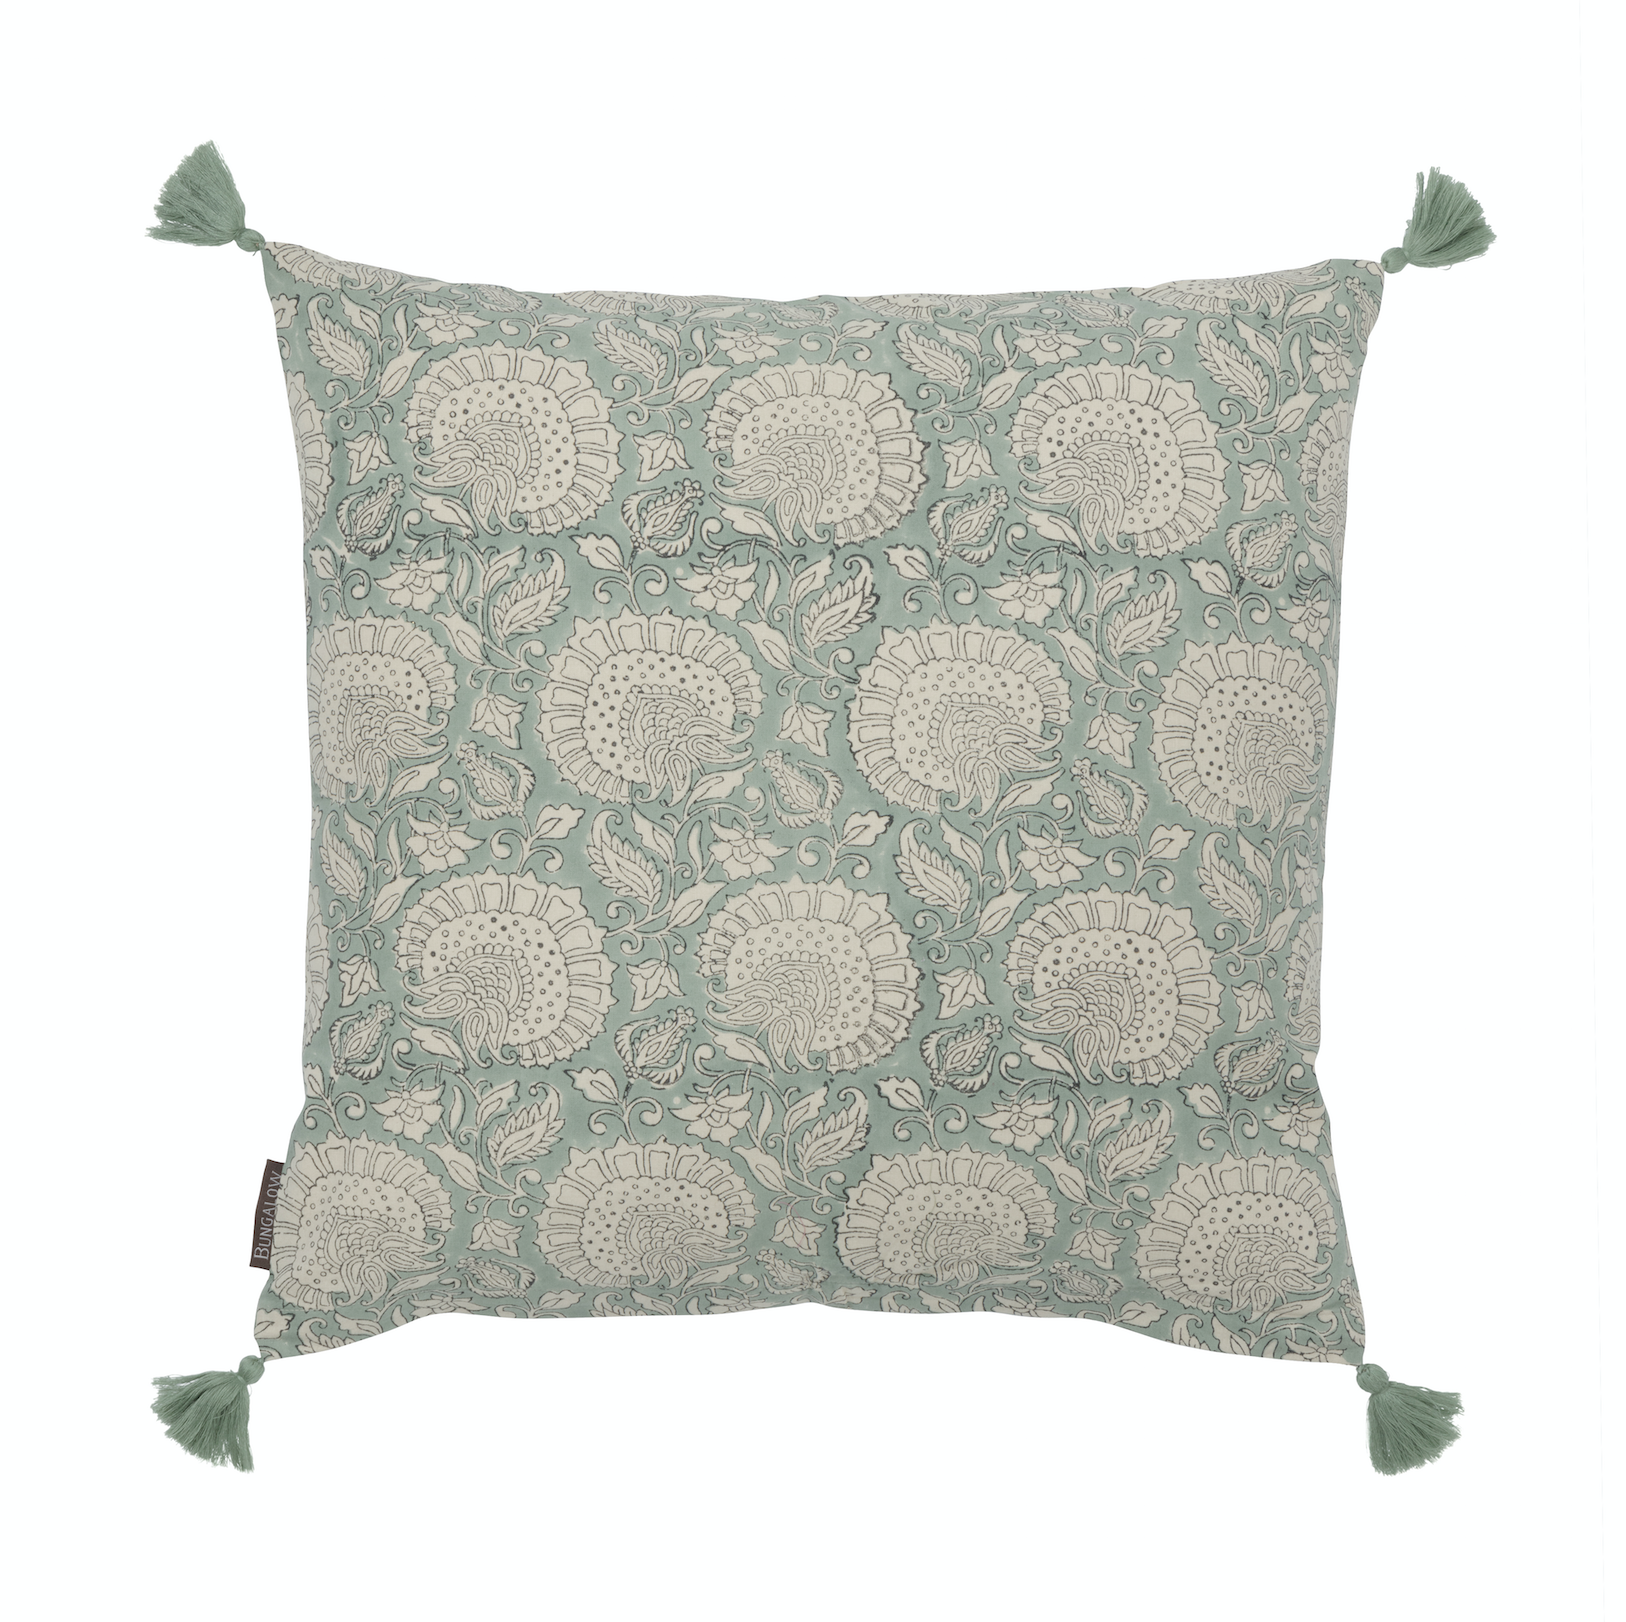 Cushion Cover 60x60 Shimla Ivy